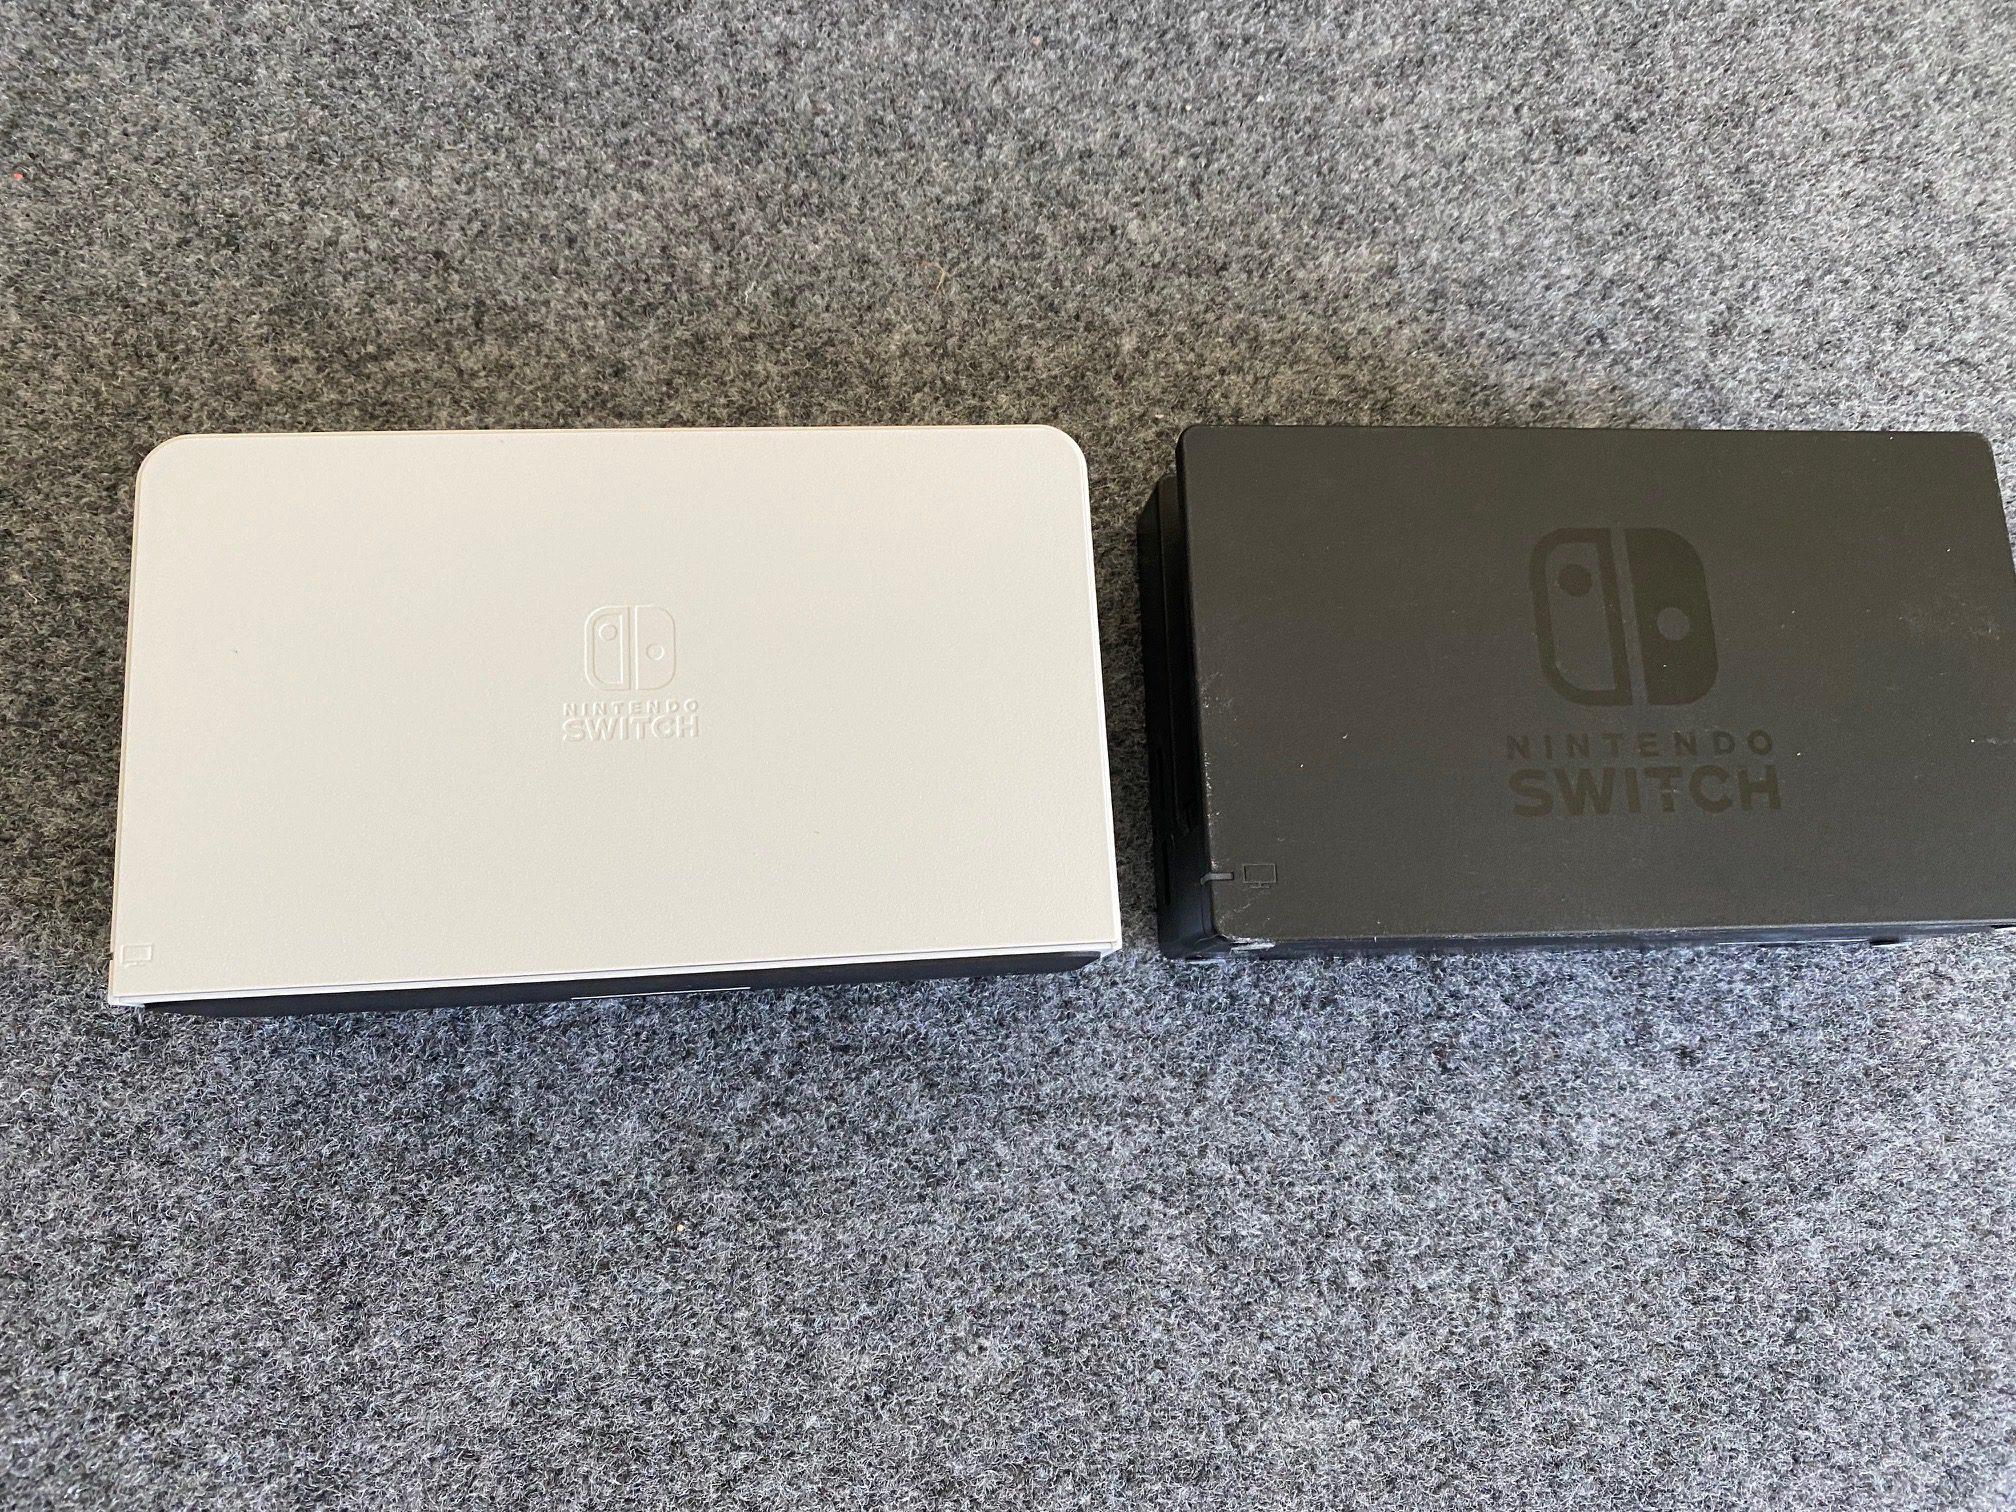 The Switch OLED dock versus original Switch dock